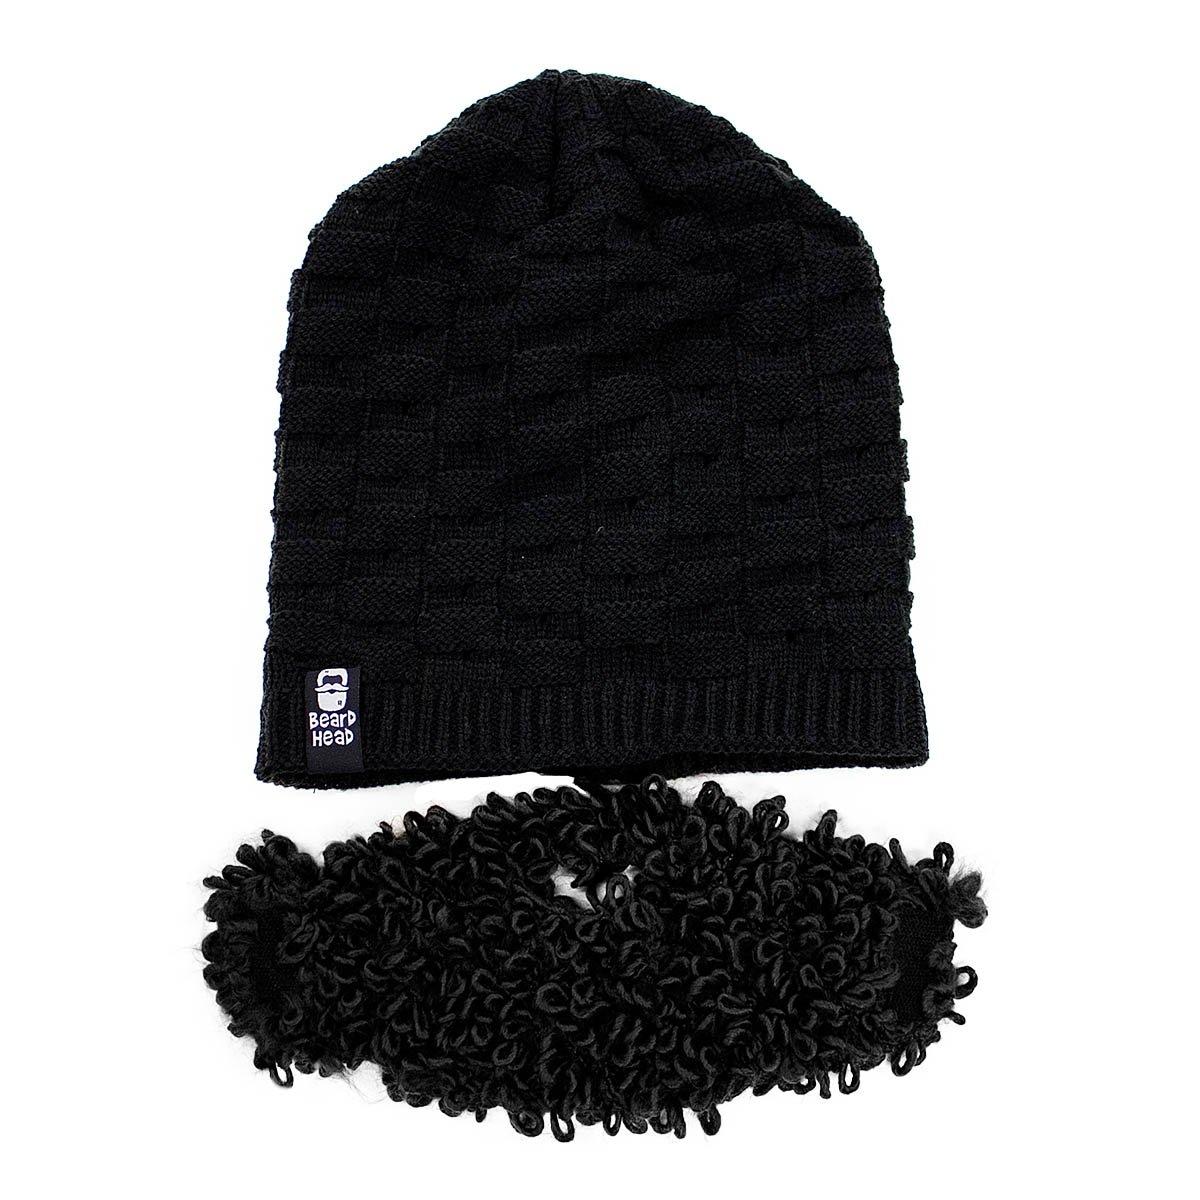 d594697bd93 Amazon.com   Beard Head - The Original Curly Atticus Knit Beard Beanie ( Black)   Sports   Outdoors